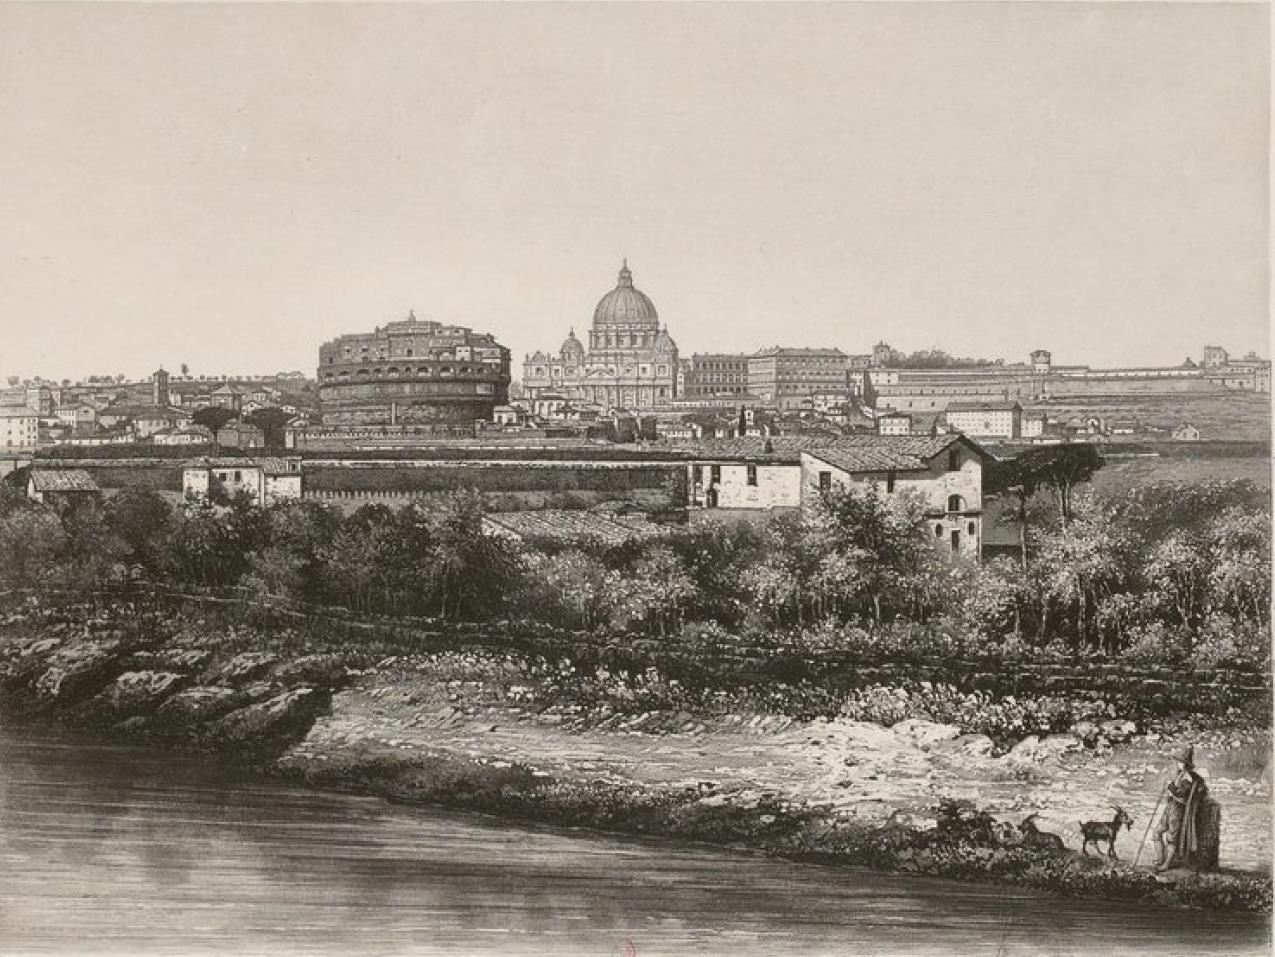 Италия. Рим. Собор св. Петра и Замок Святого Ангела